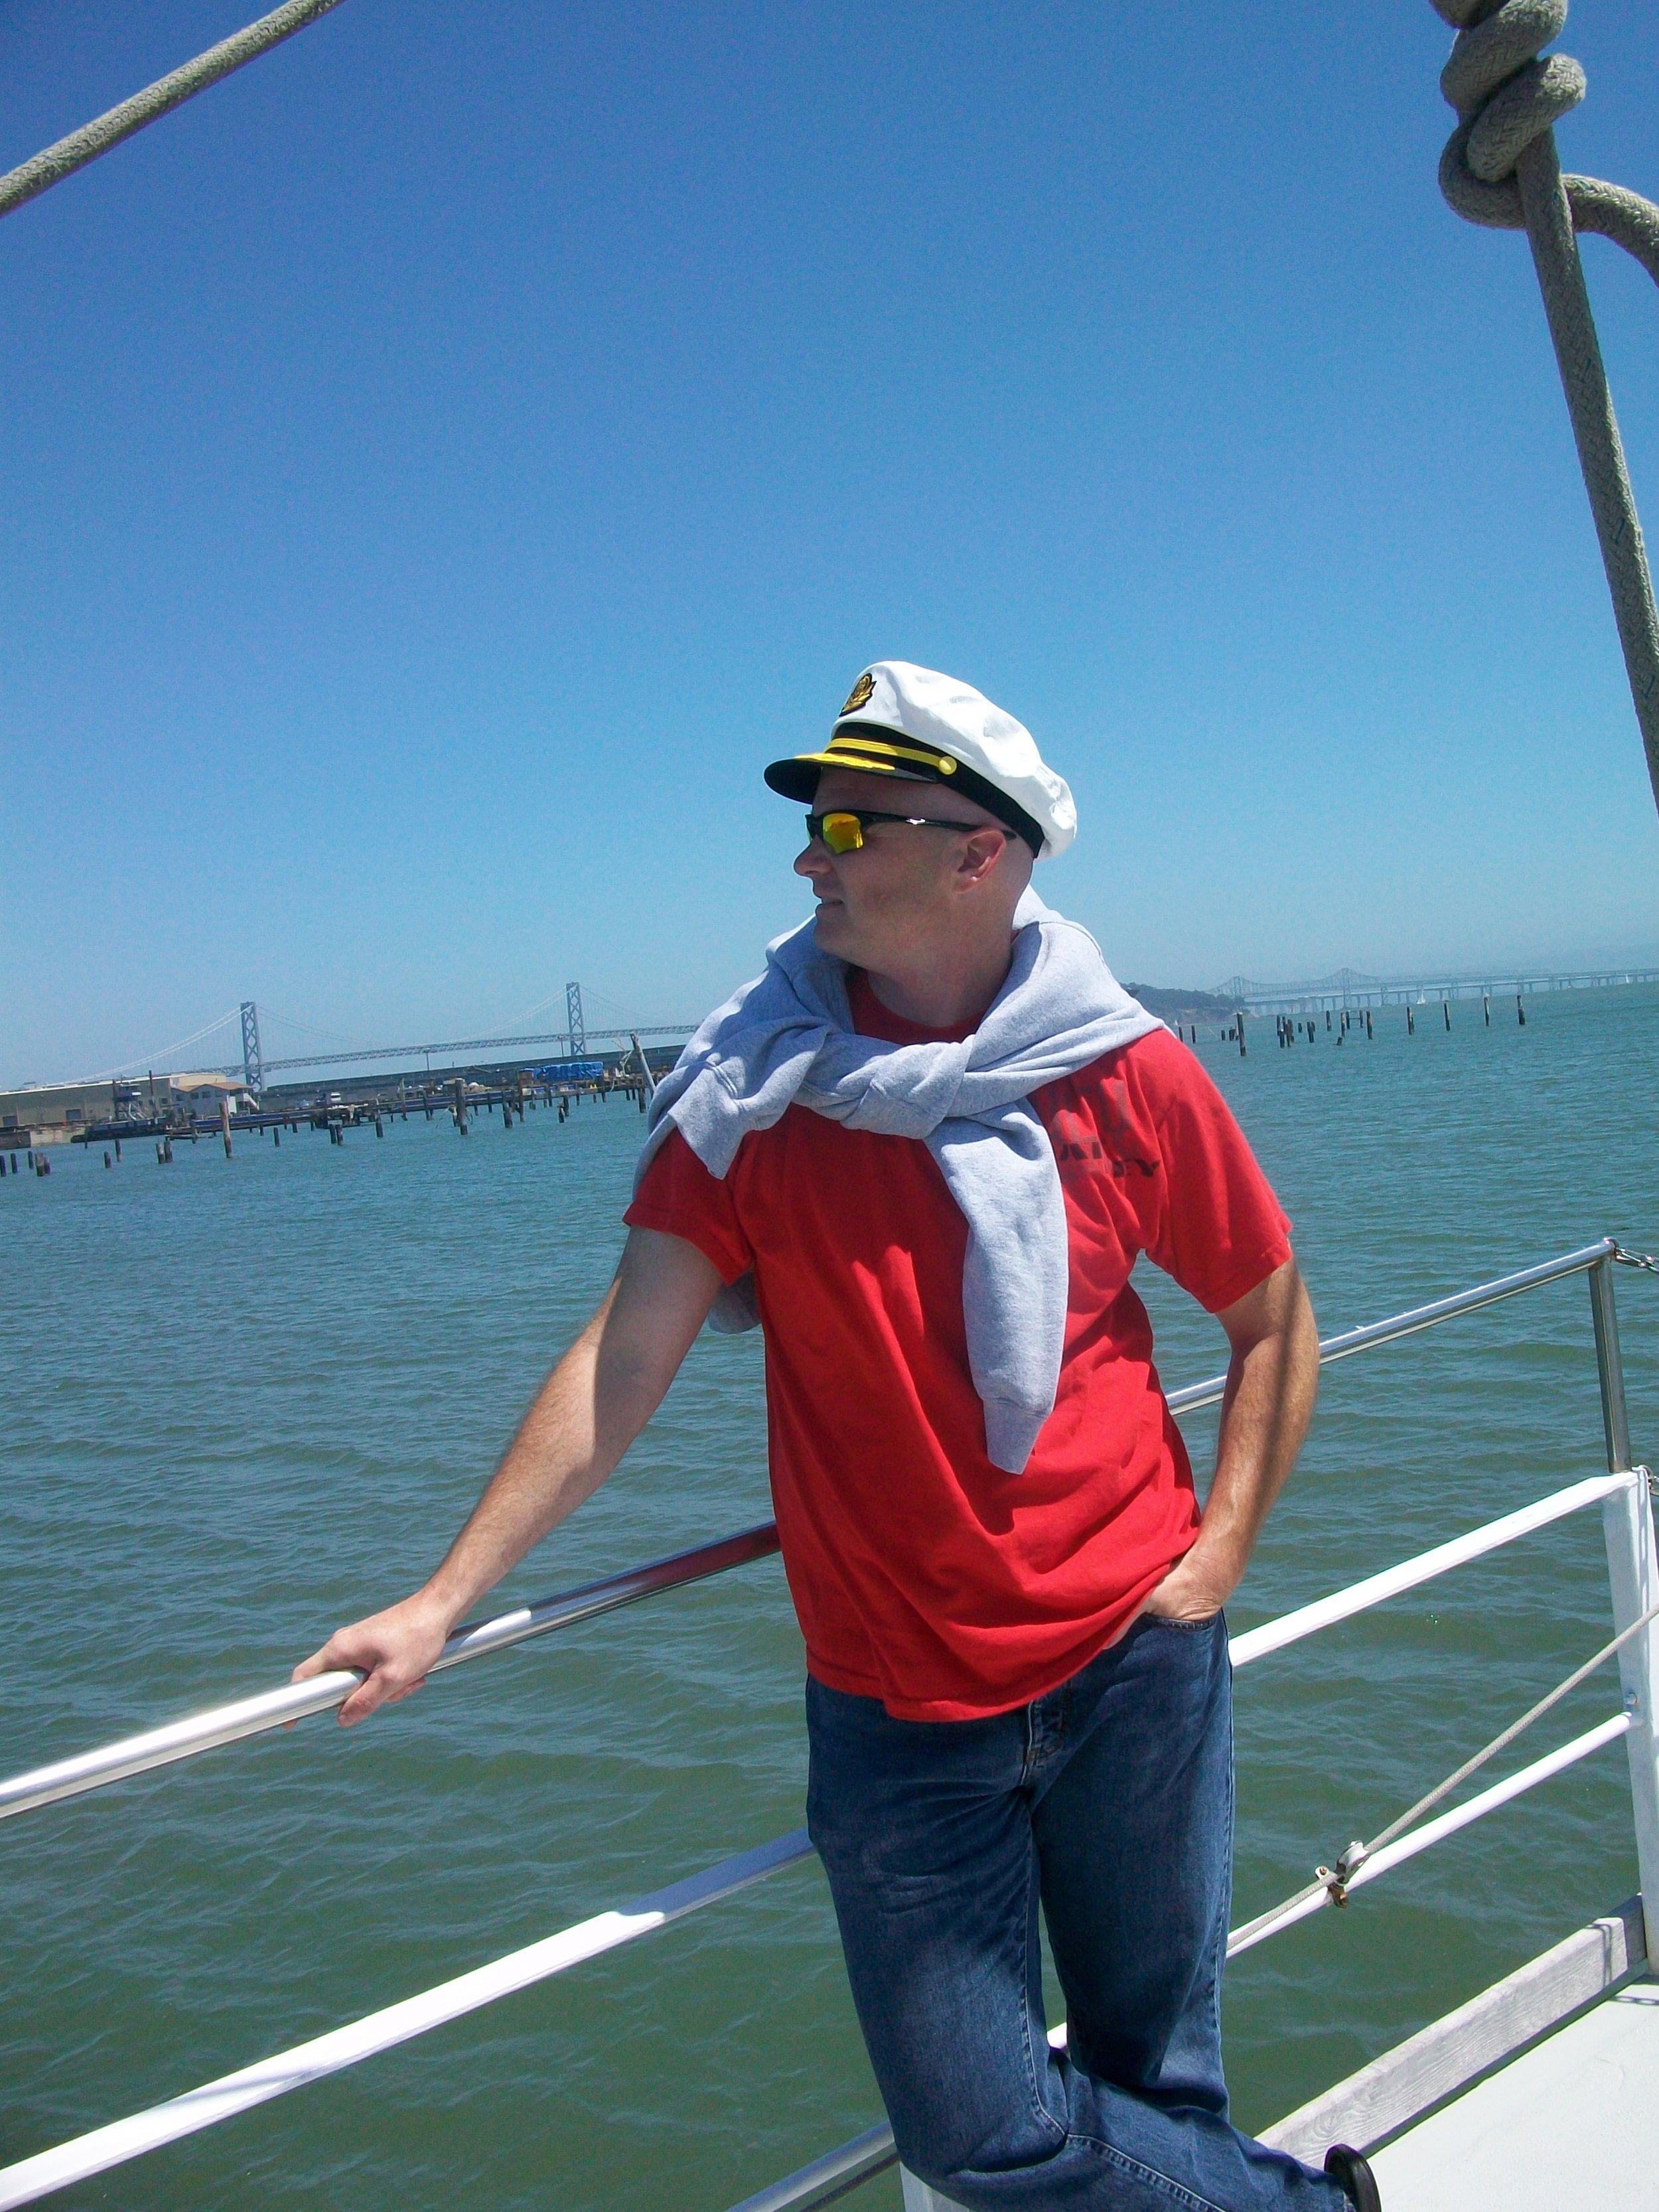 Going seaward